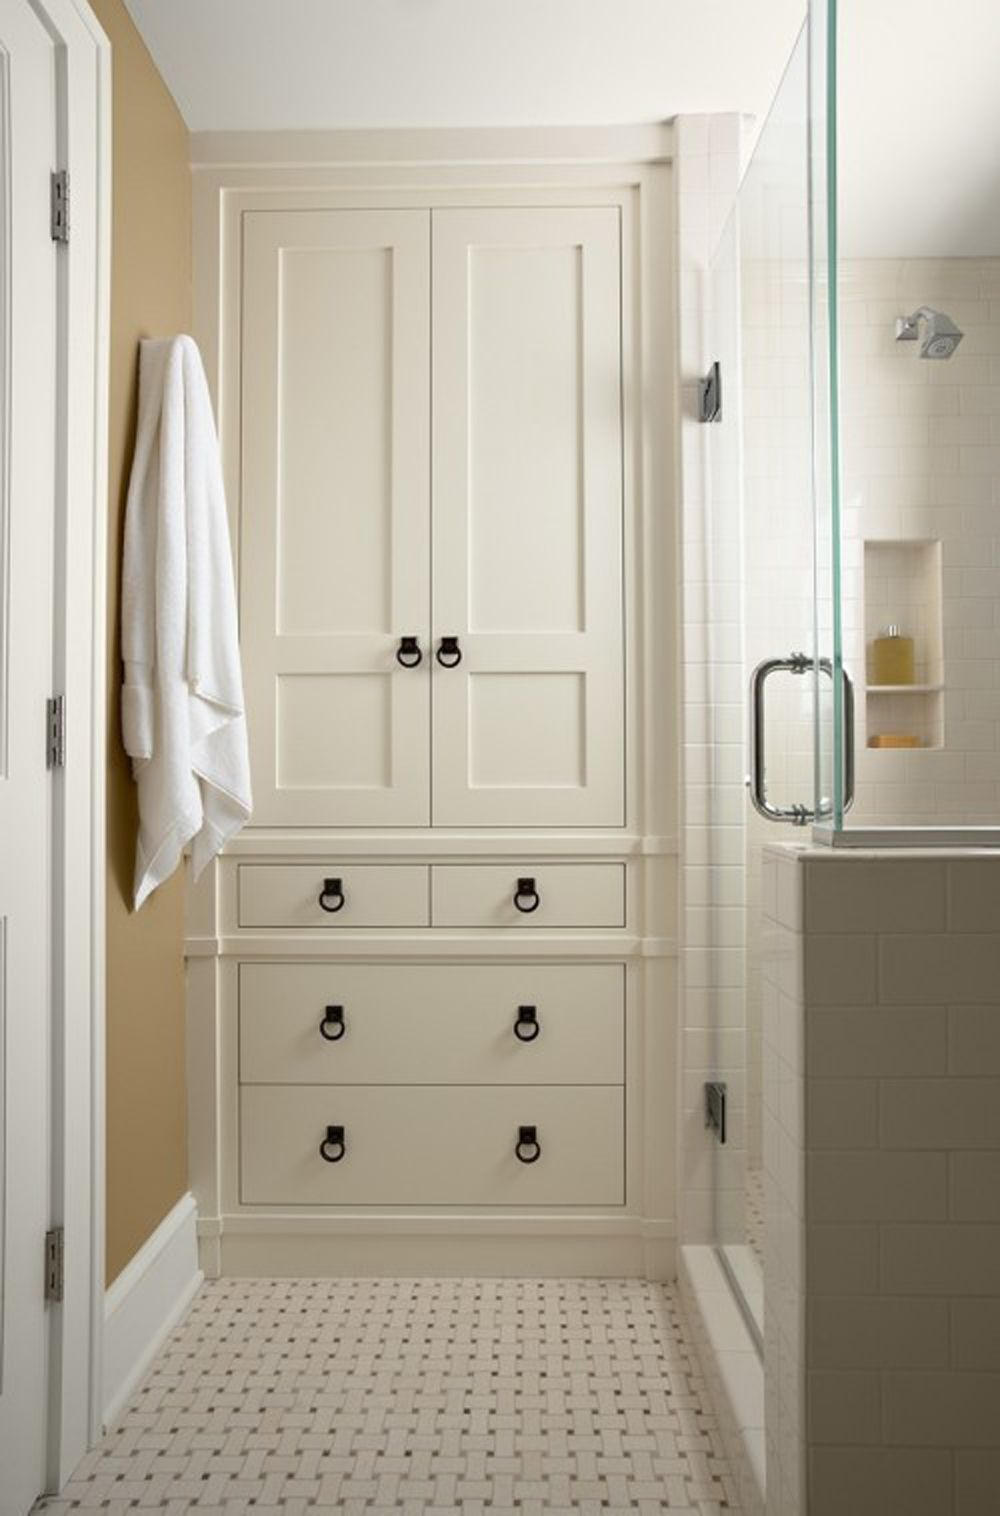 Bathroom : Freestanding White Bathroom Cabinet Storage | Around the ...